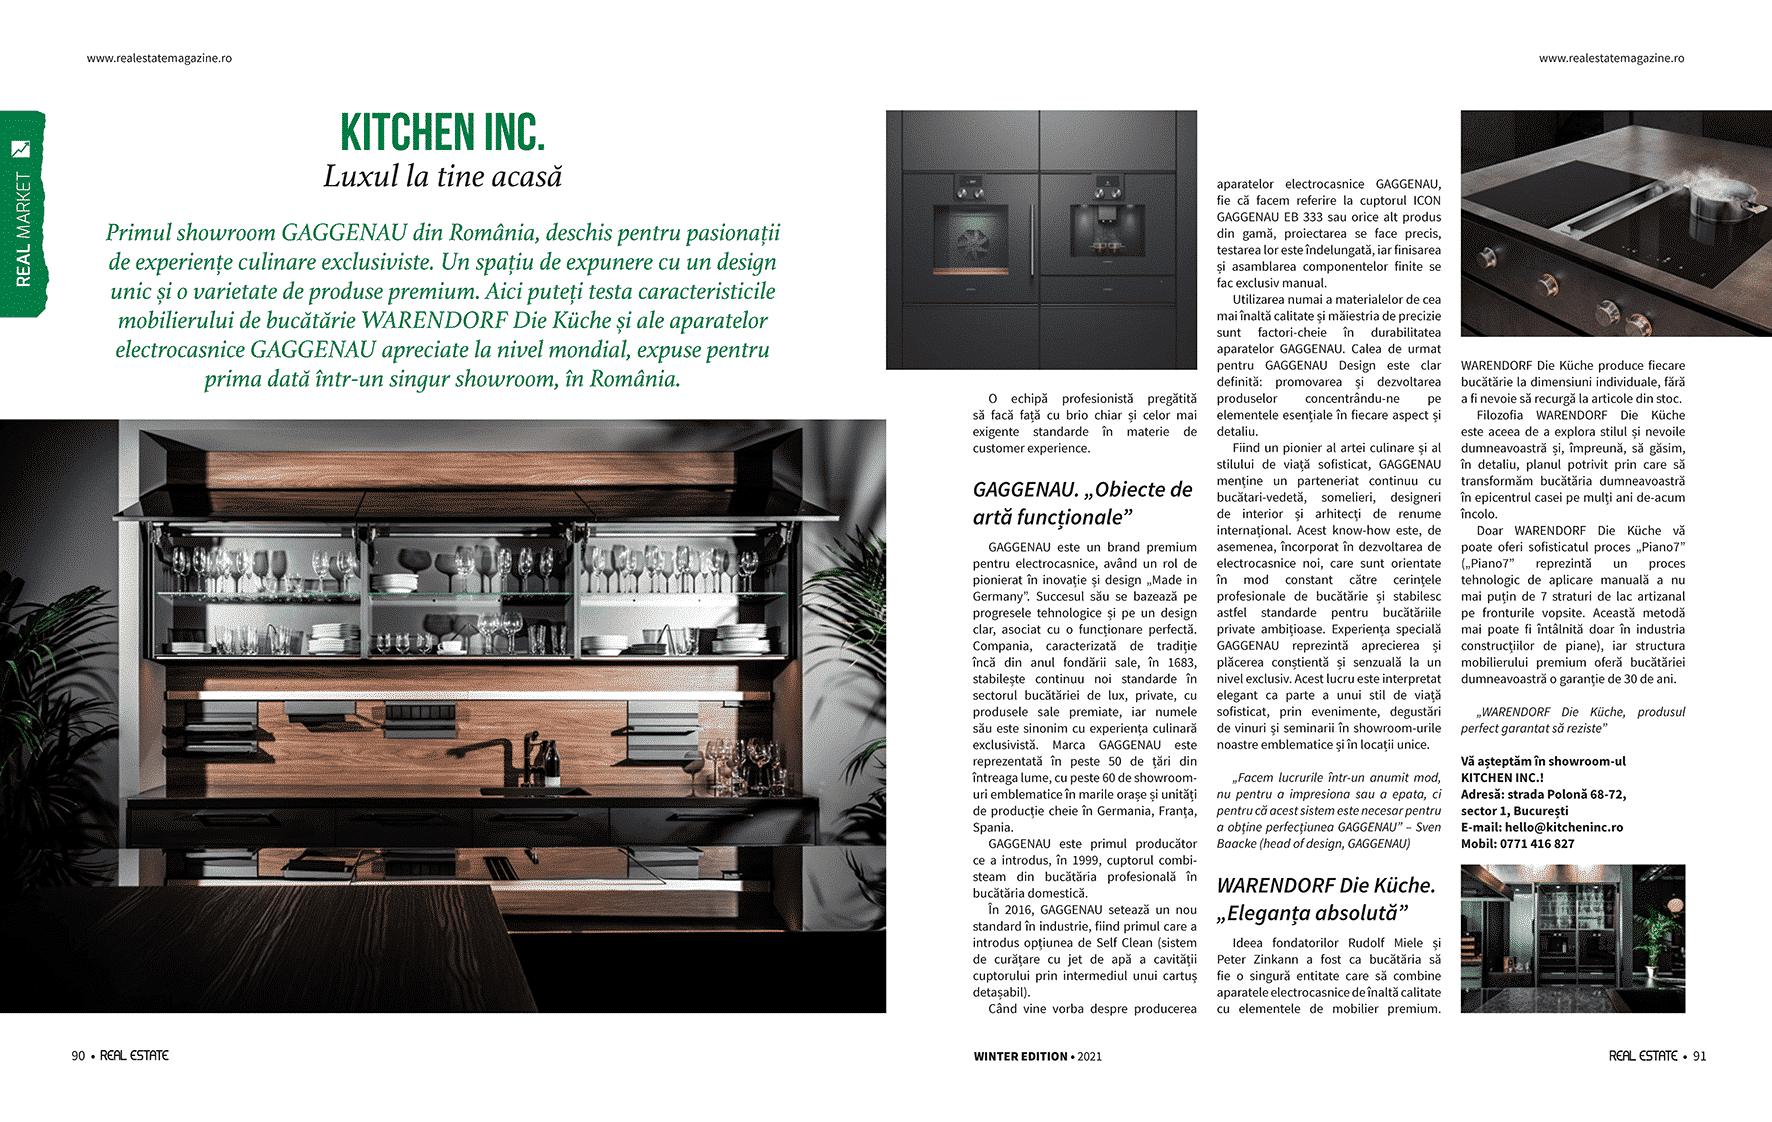 Advertorial KitchenInc